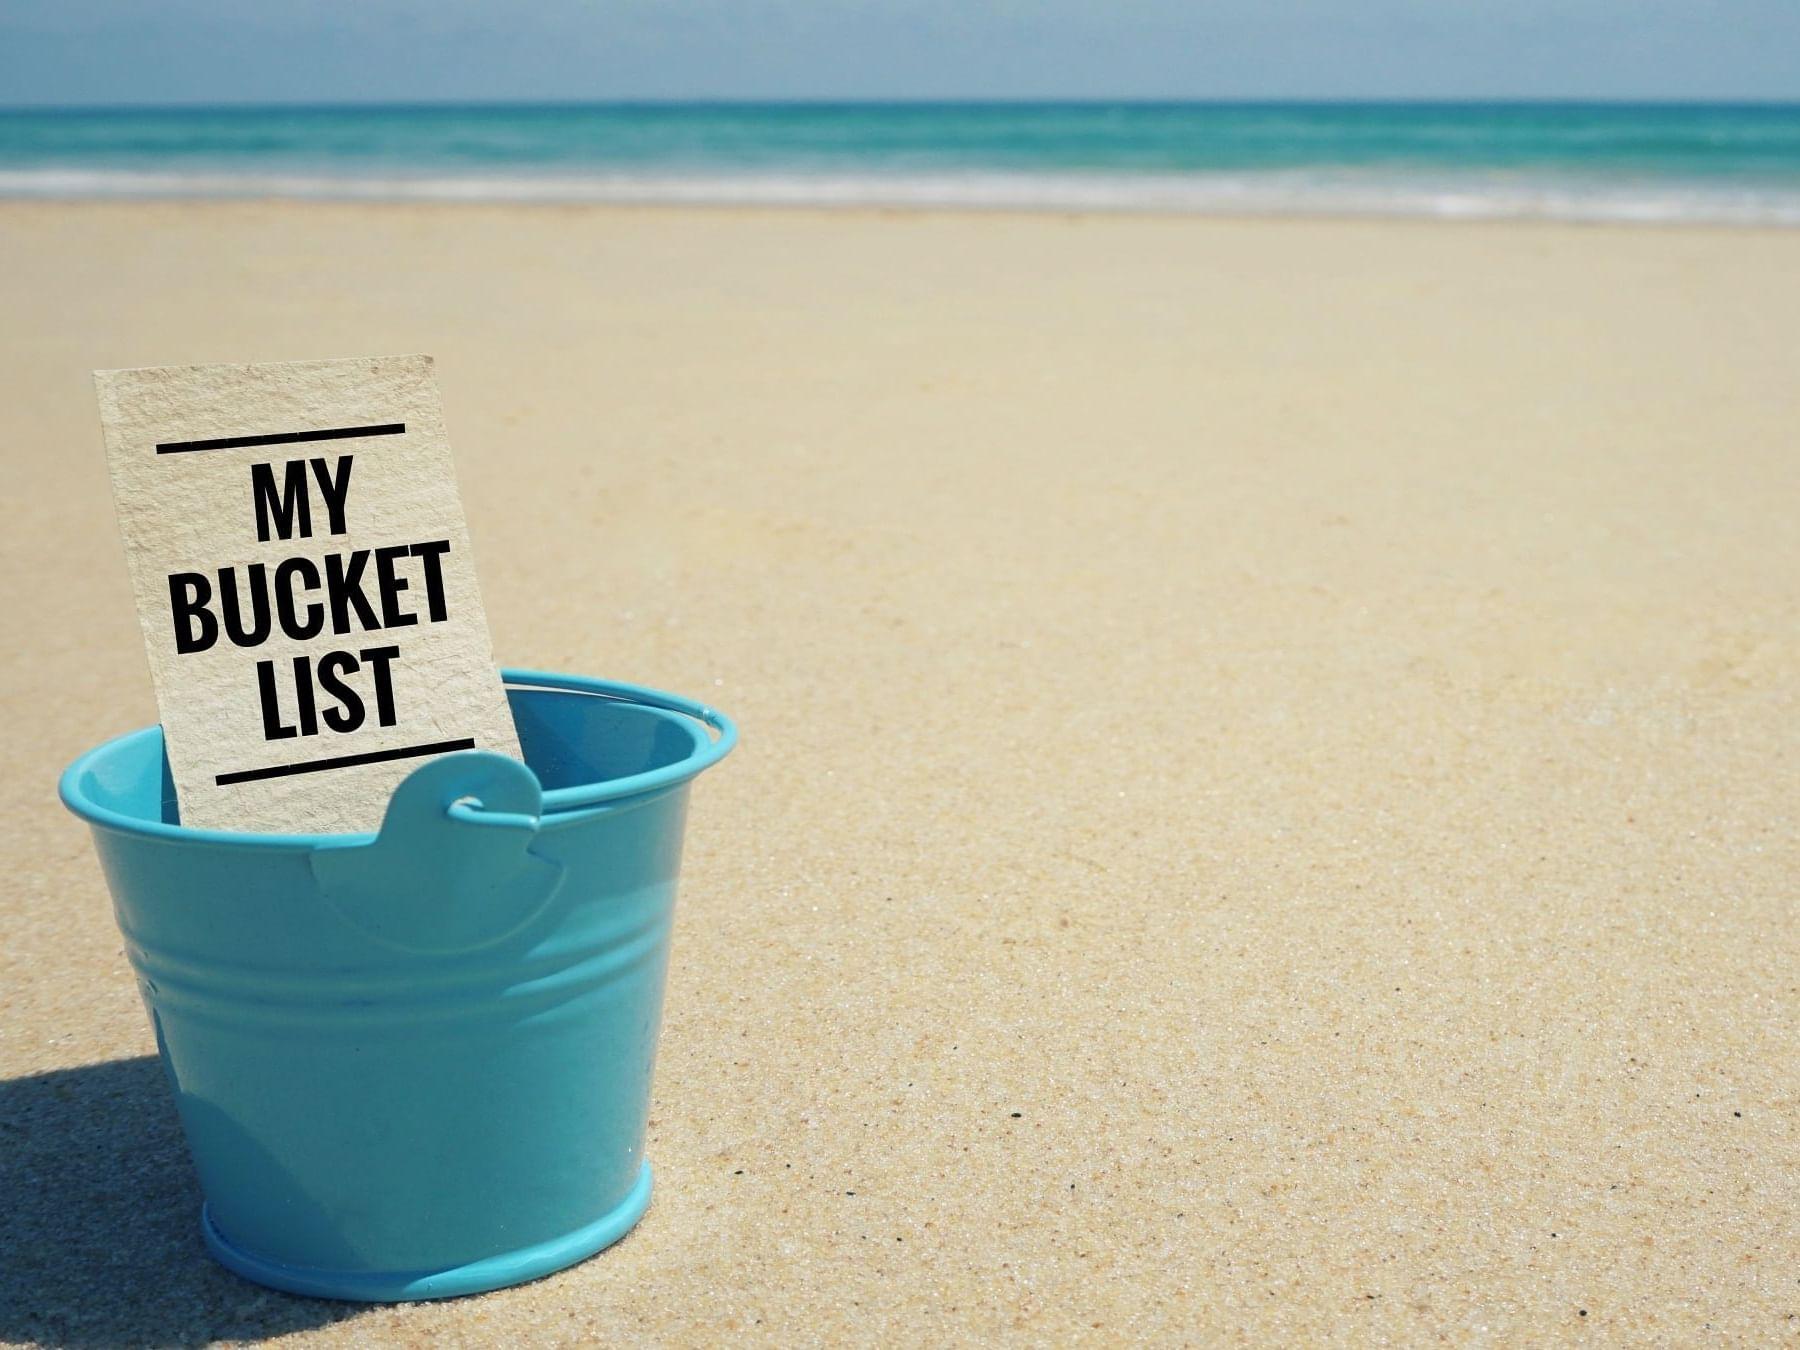 Blue bucket on beach at Daydream Island Resort